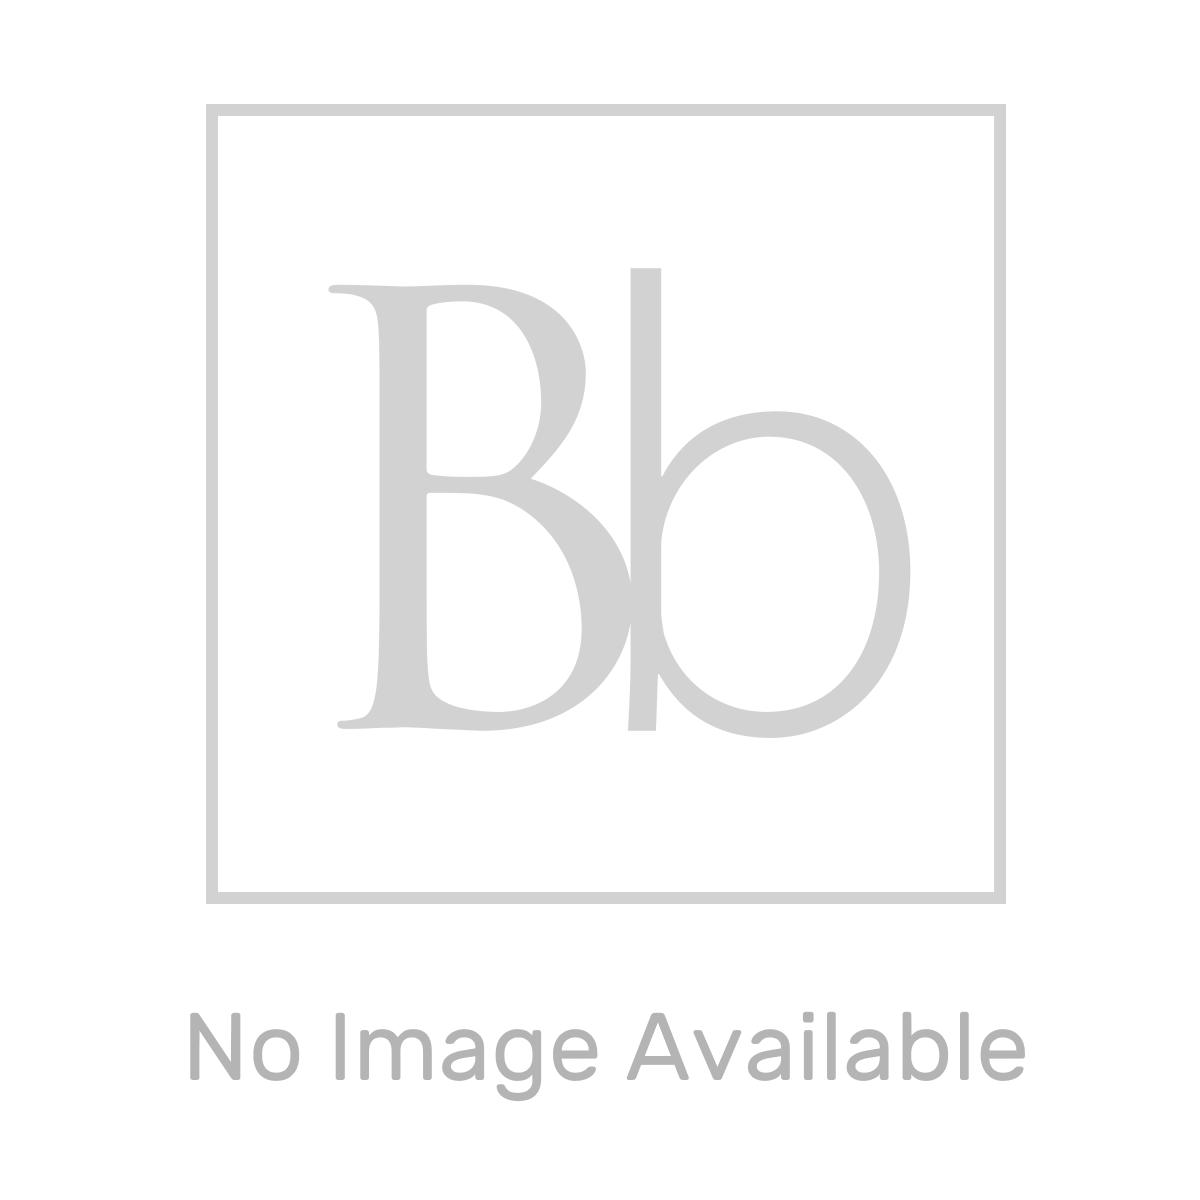 Burlington Horizontal WC Roll Holder